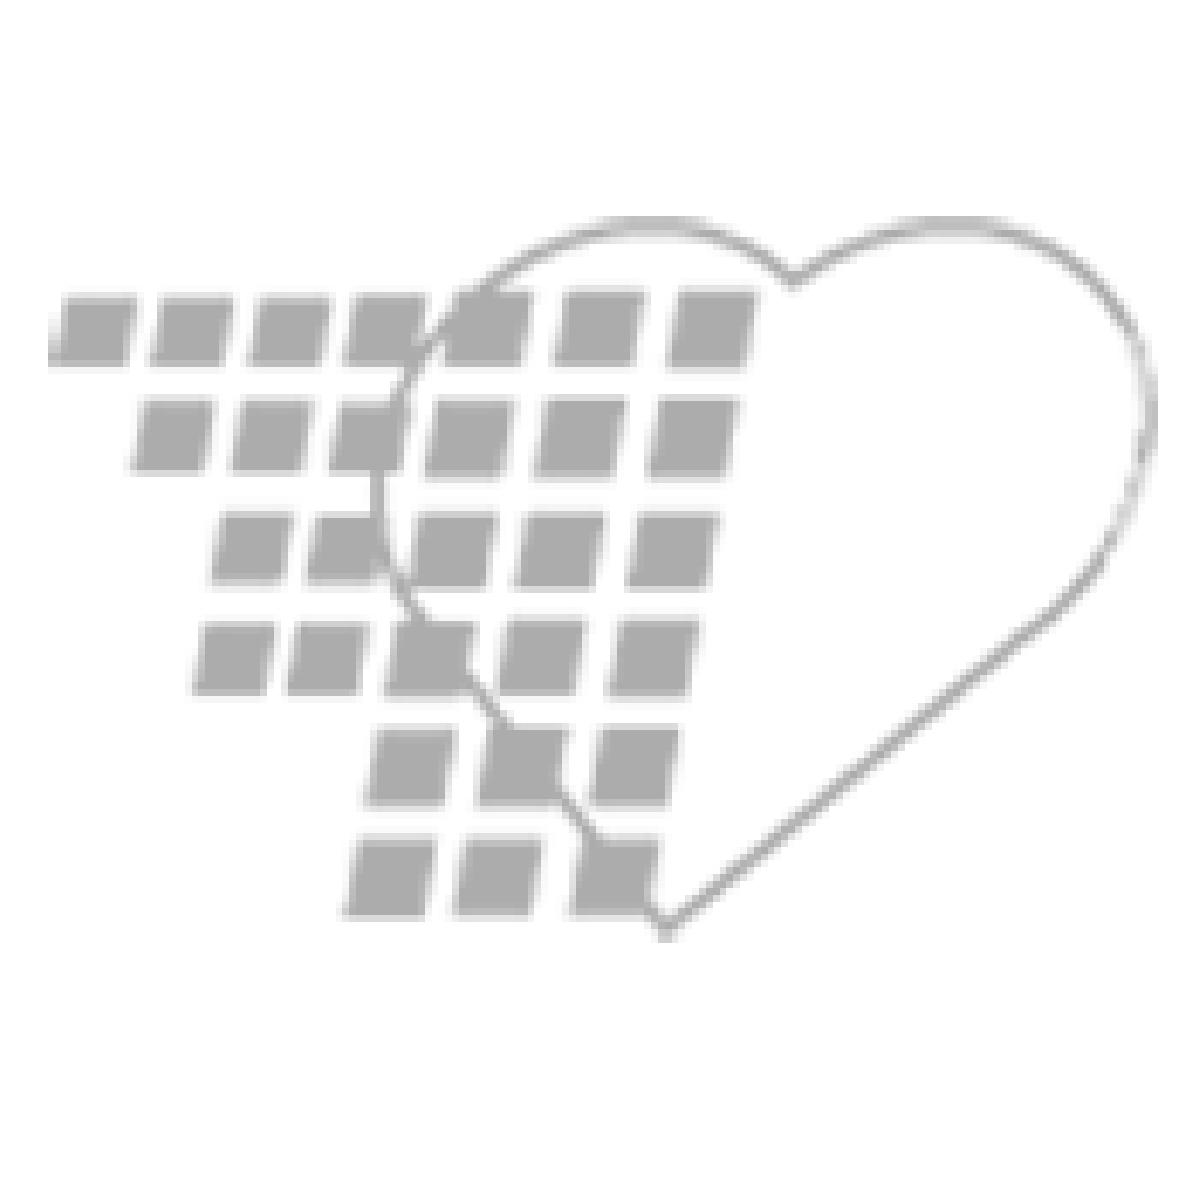 06-93-1352 - Demo Dose® Belladonn Alkalods (Donnatl) Elixr 473 mL 16.2 mg/5 mL